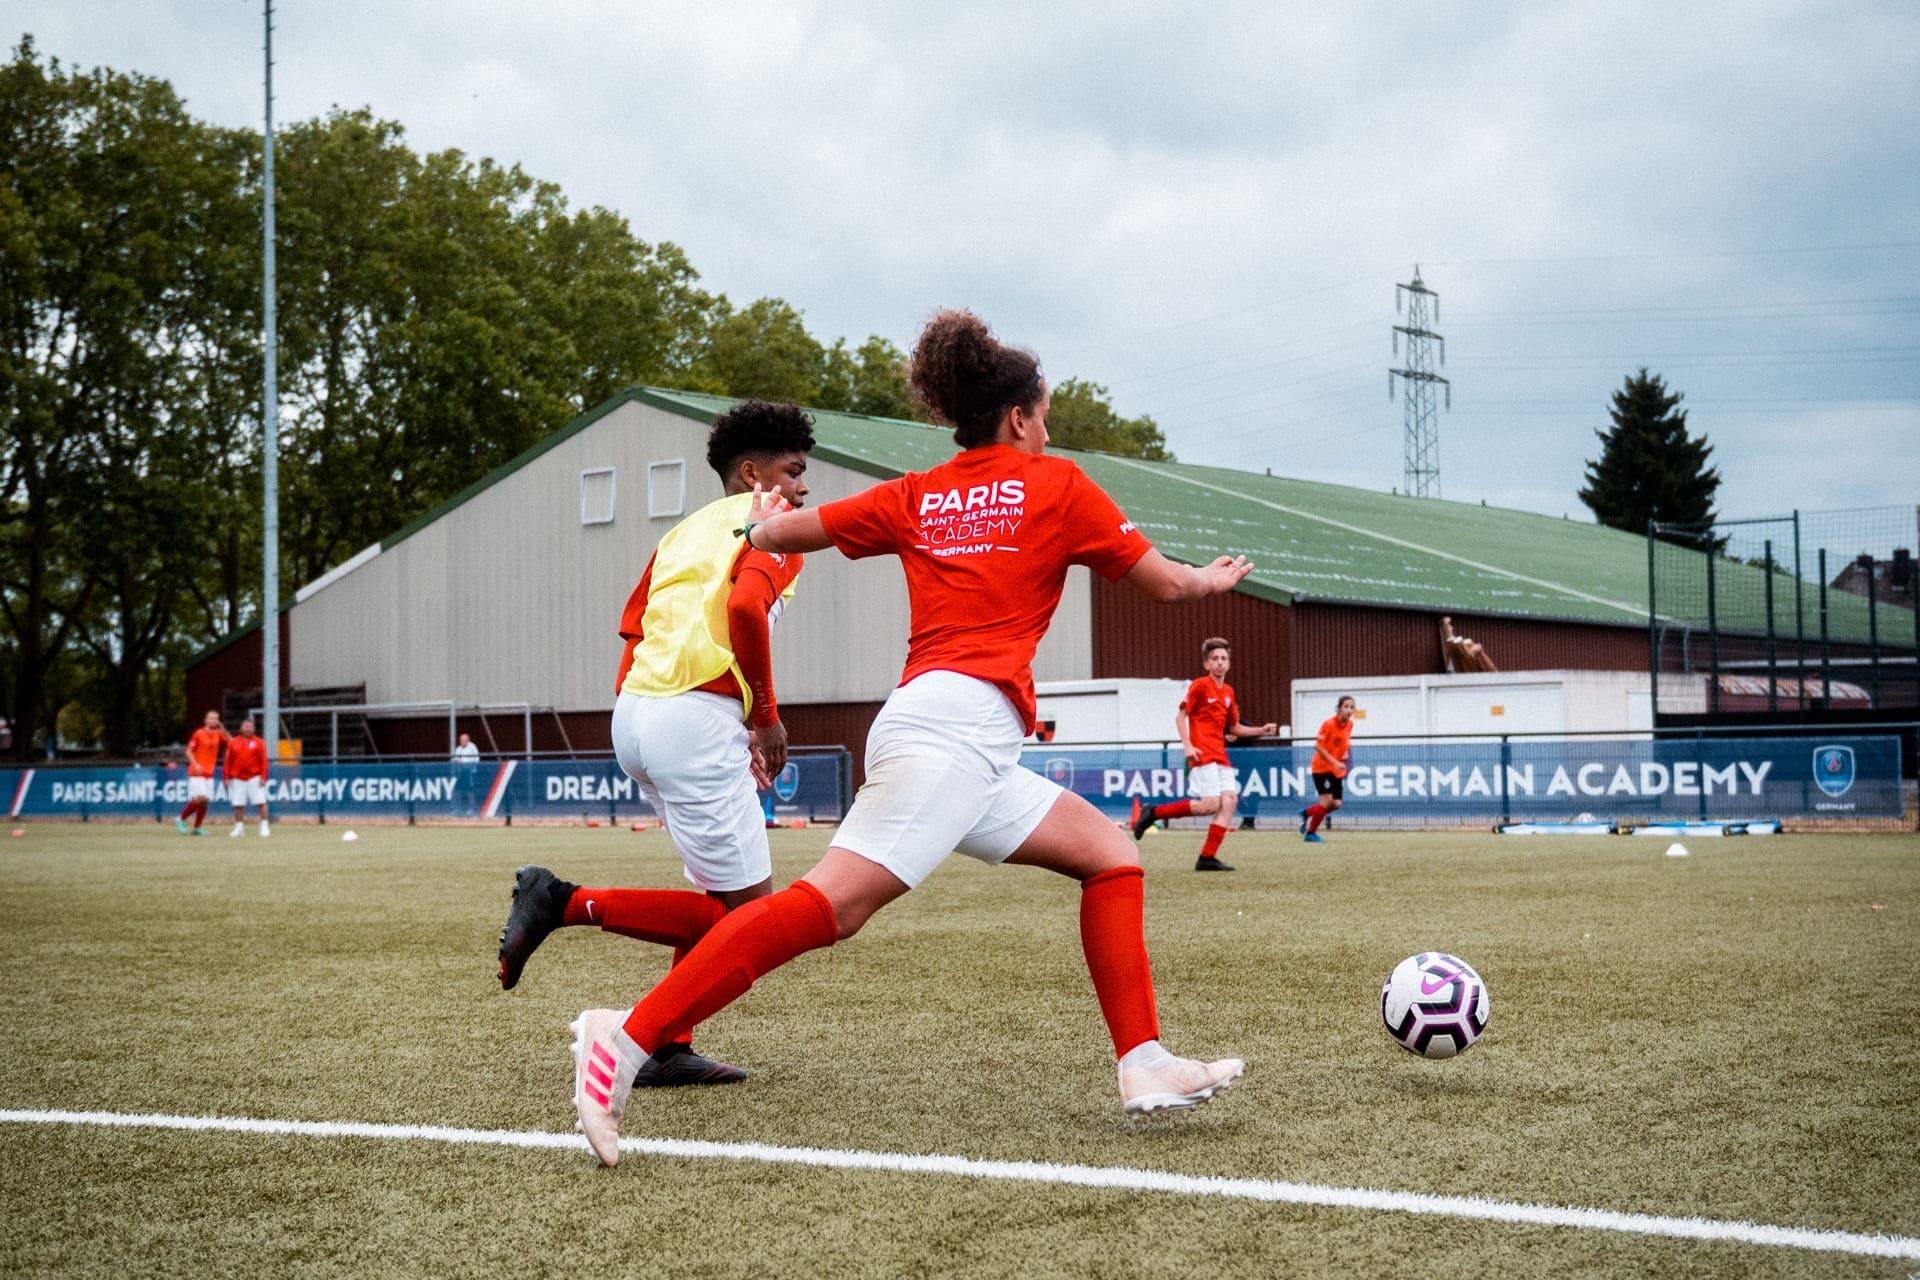 PSG Academy Germany Trainingseinheit Training session 1 vs 1